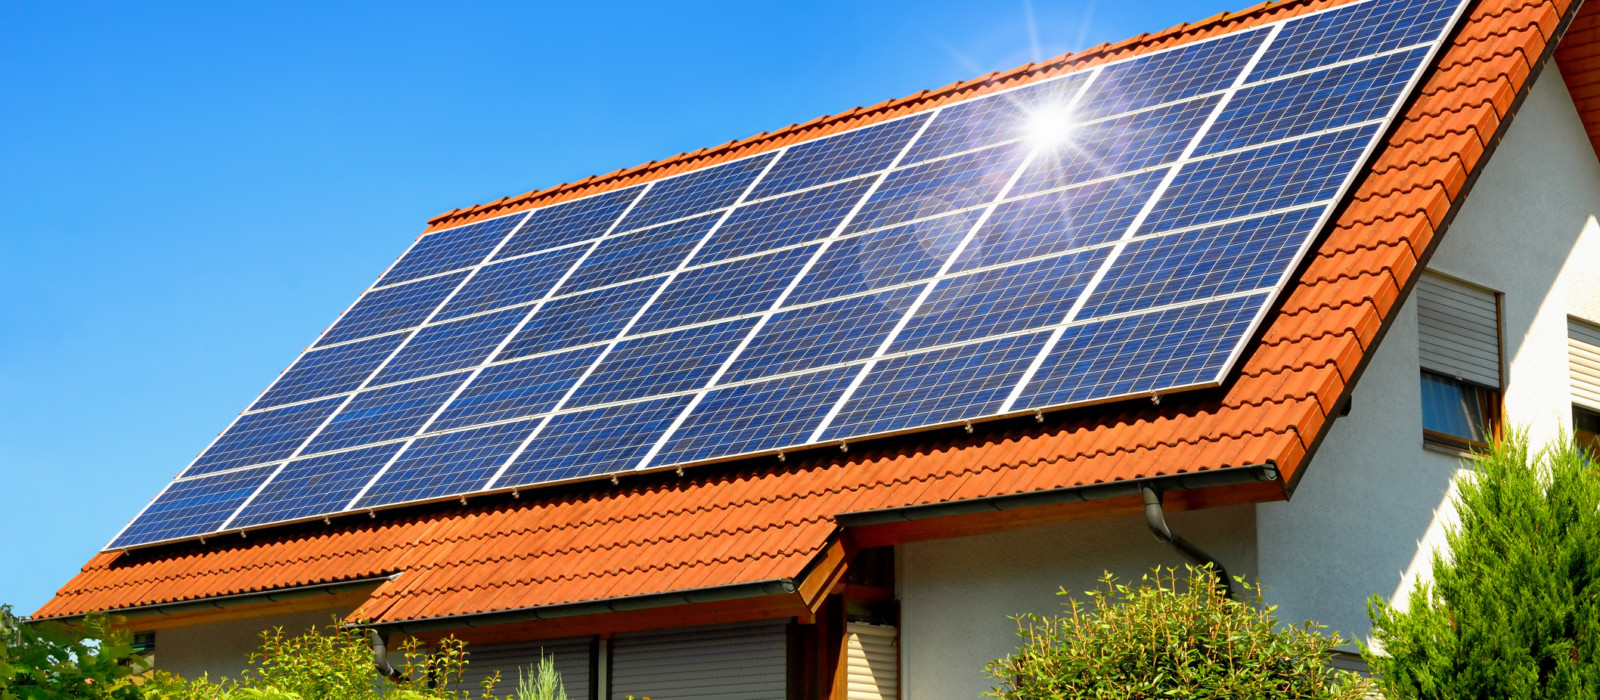 energy advice - solar panel roof